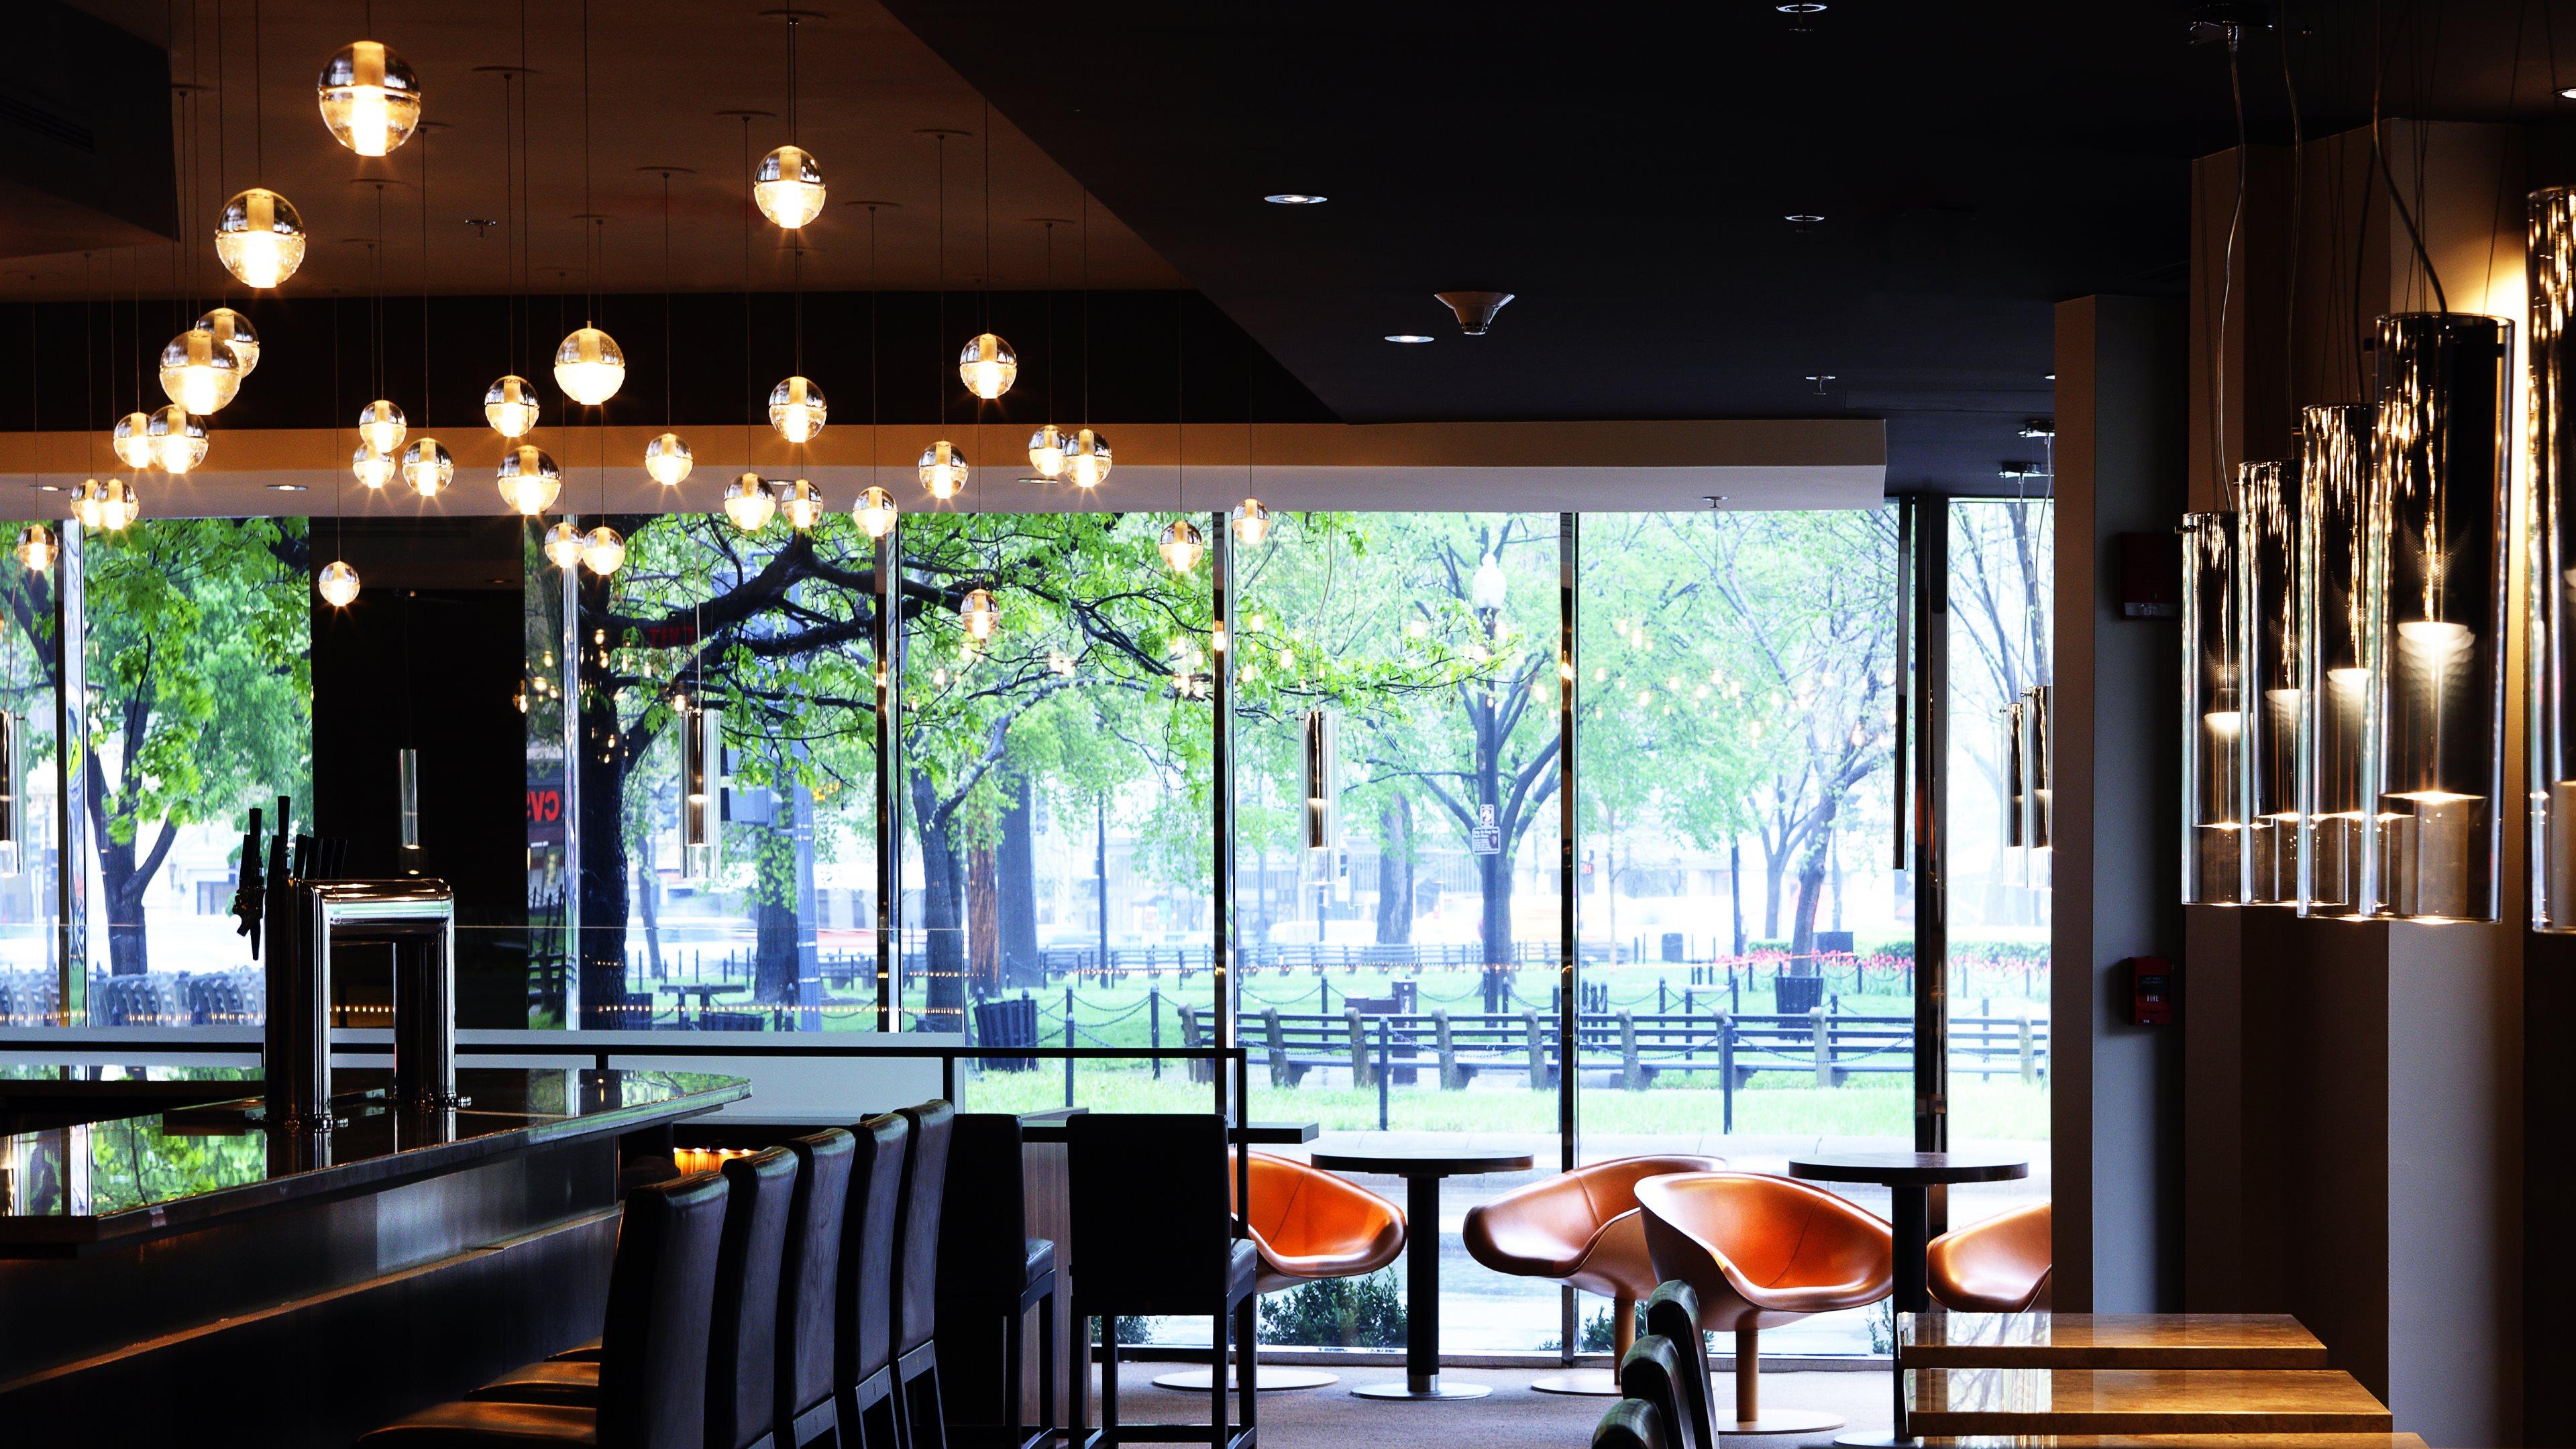 Luxury hotel design hd wallpapers 4k macbook and desktop for Interior design 4k images